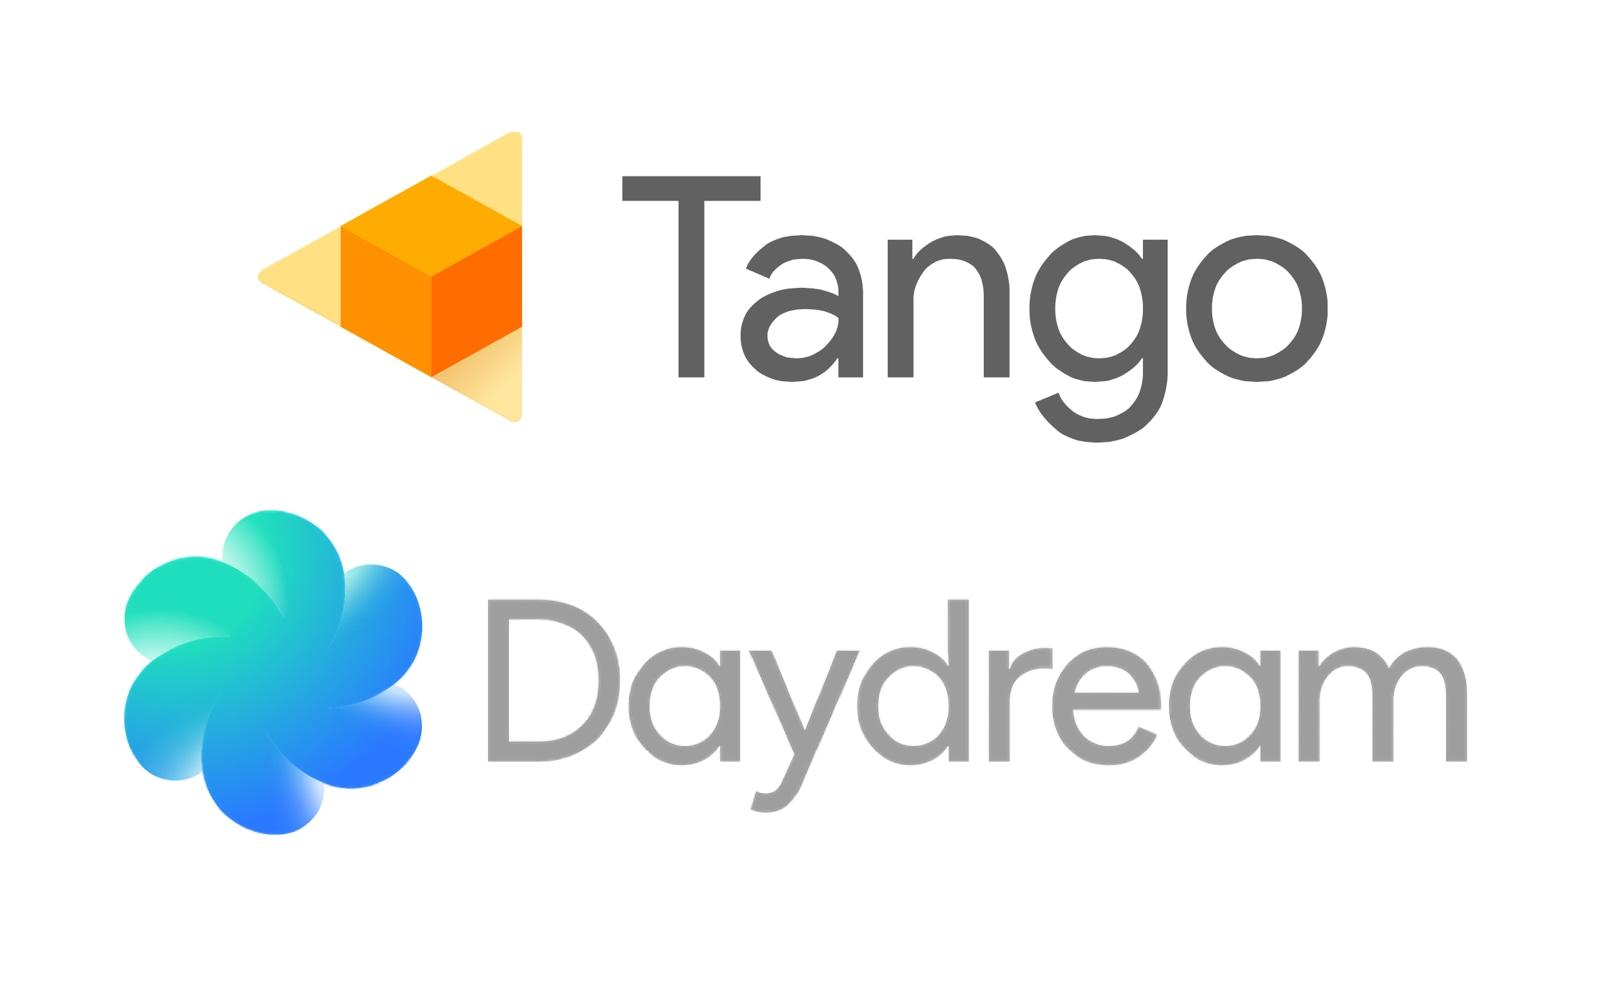 ASUS ZenFone AR Tango Daydream